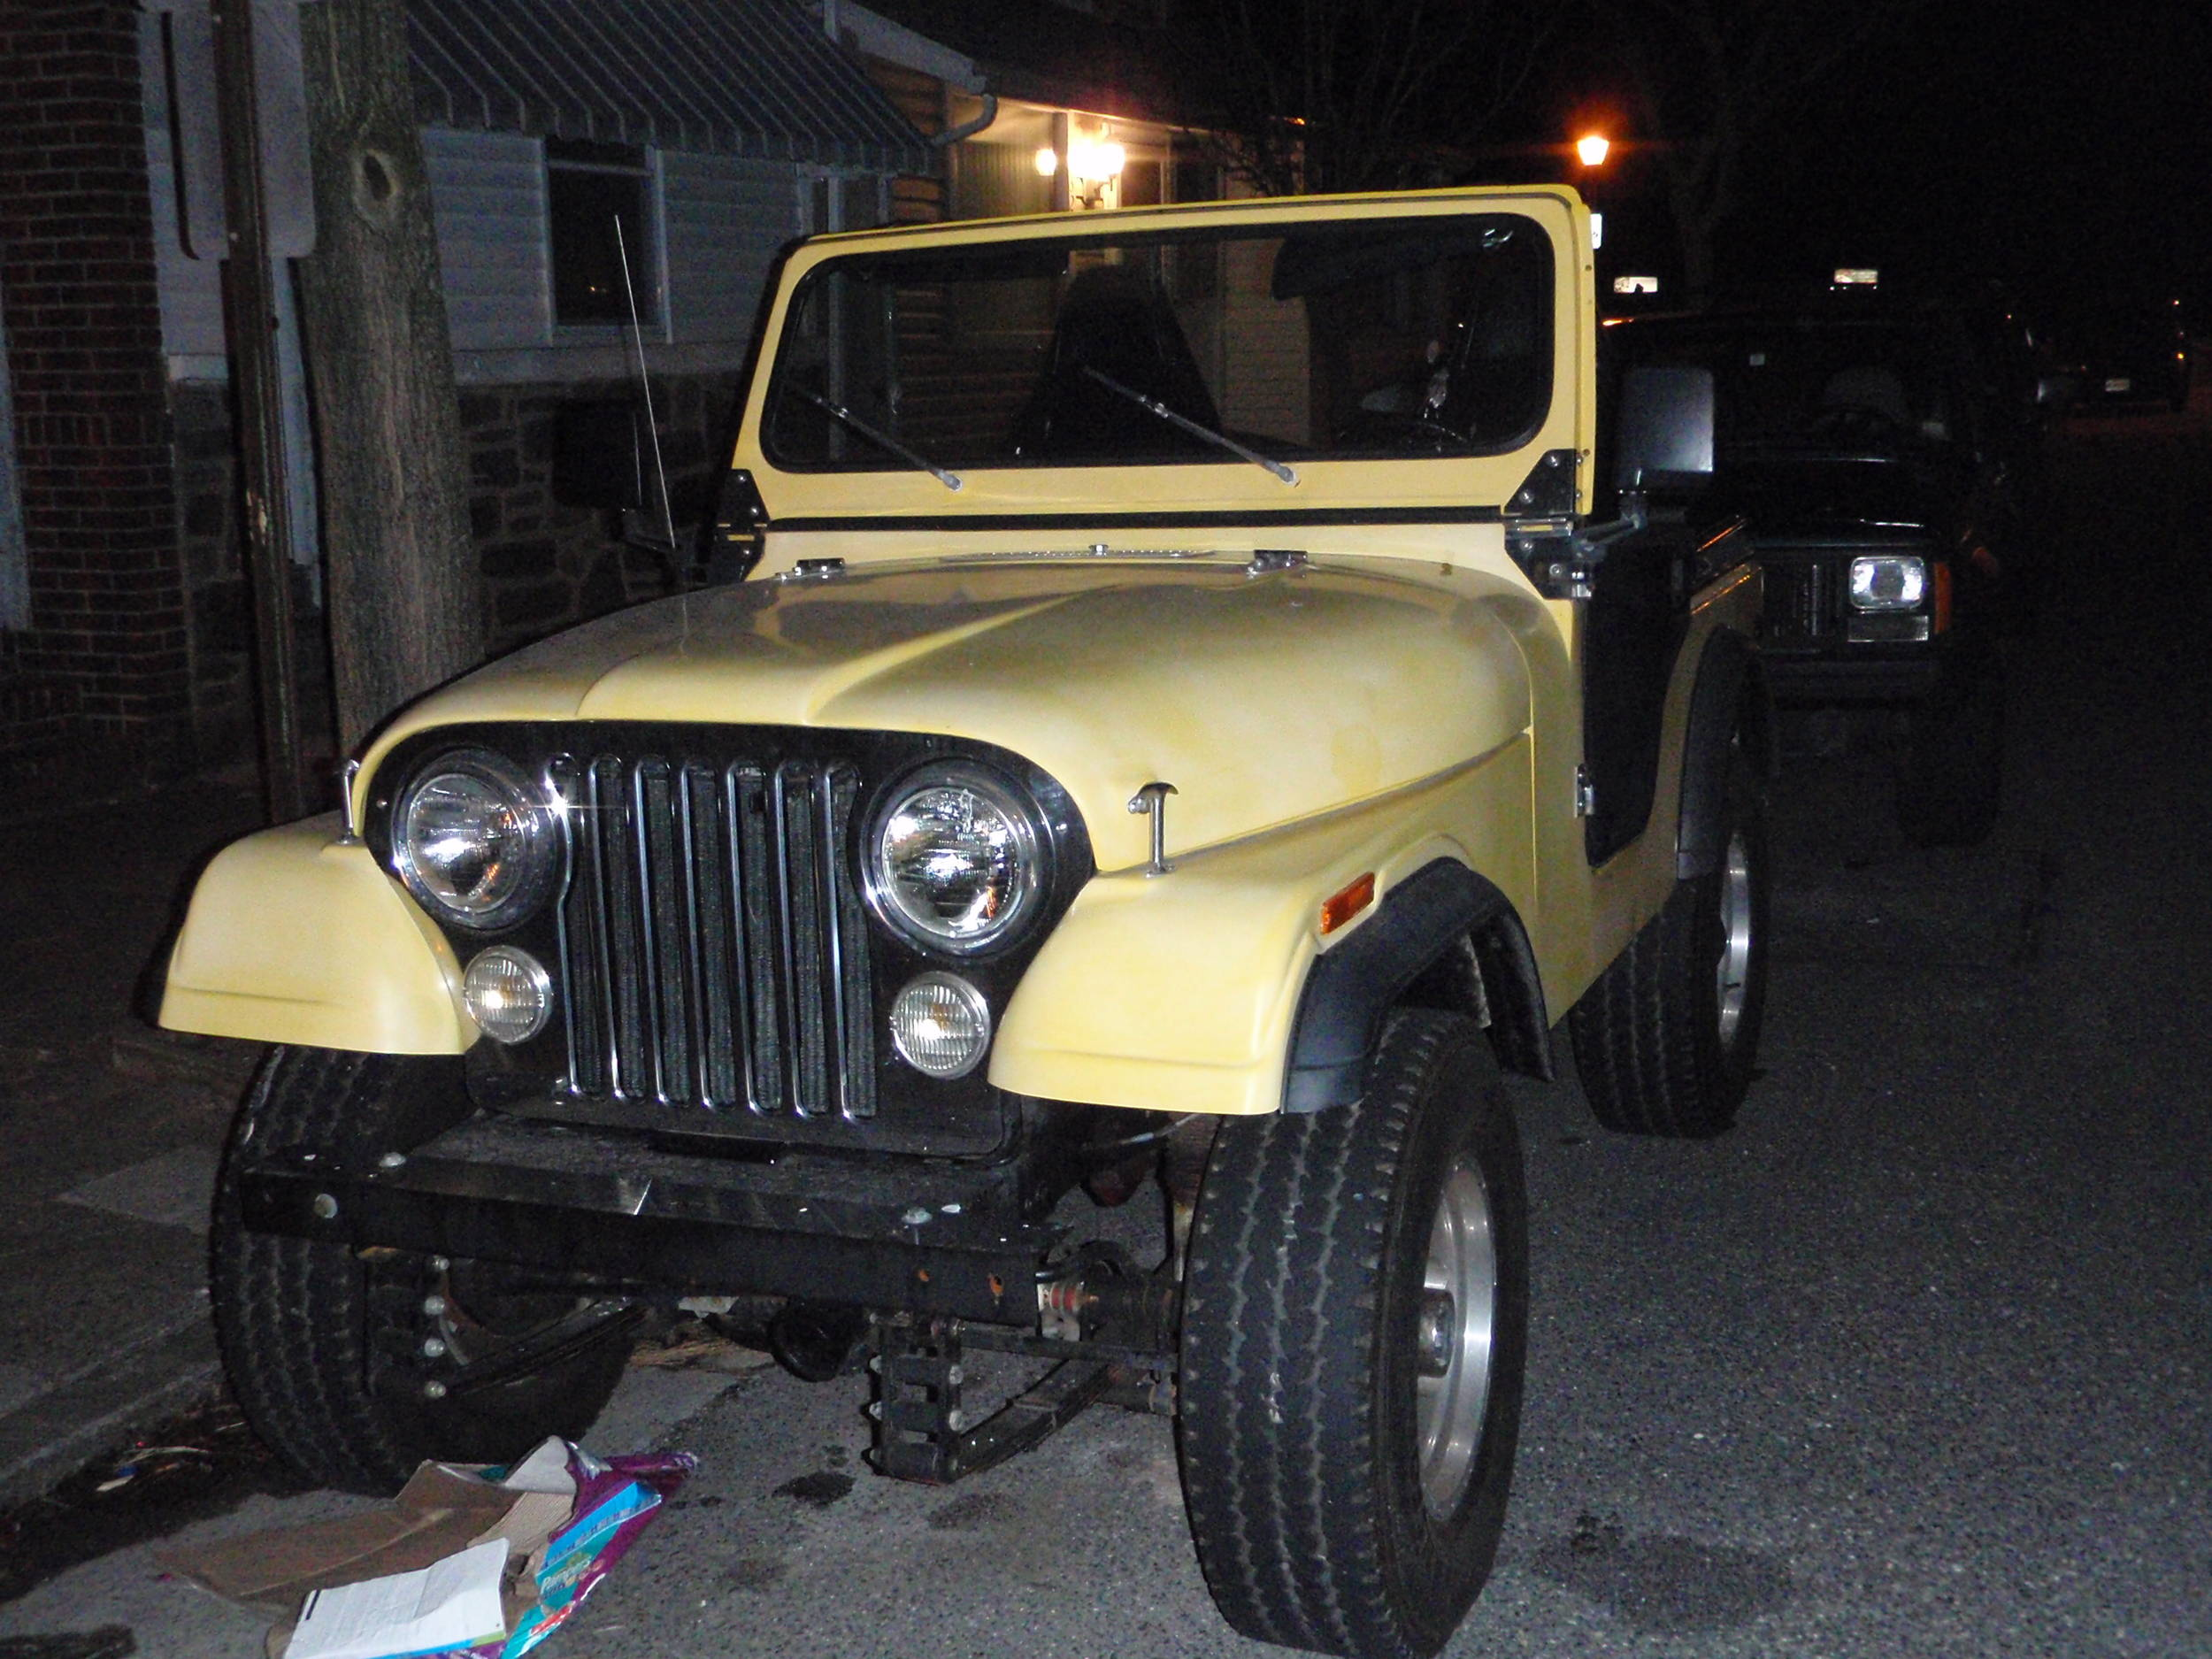 My 1978 CJ5